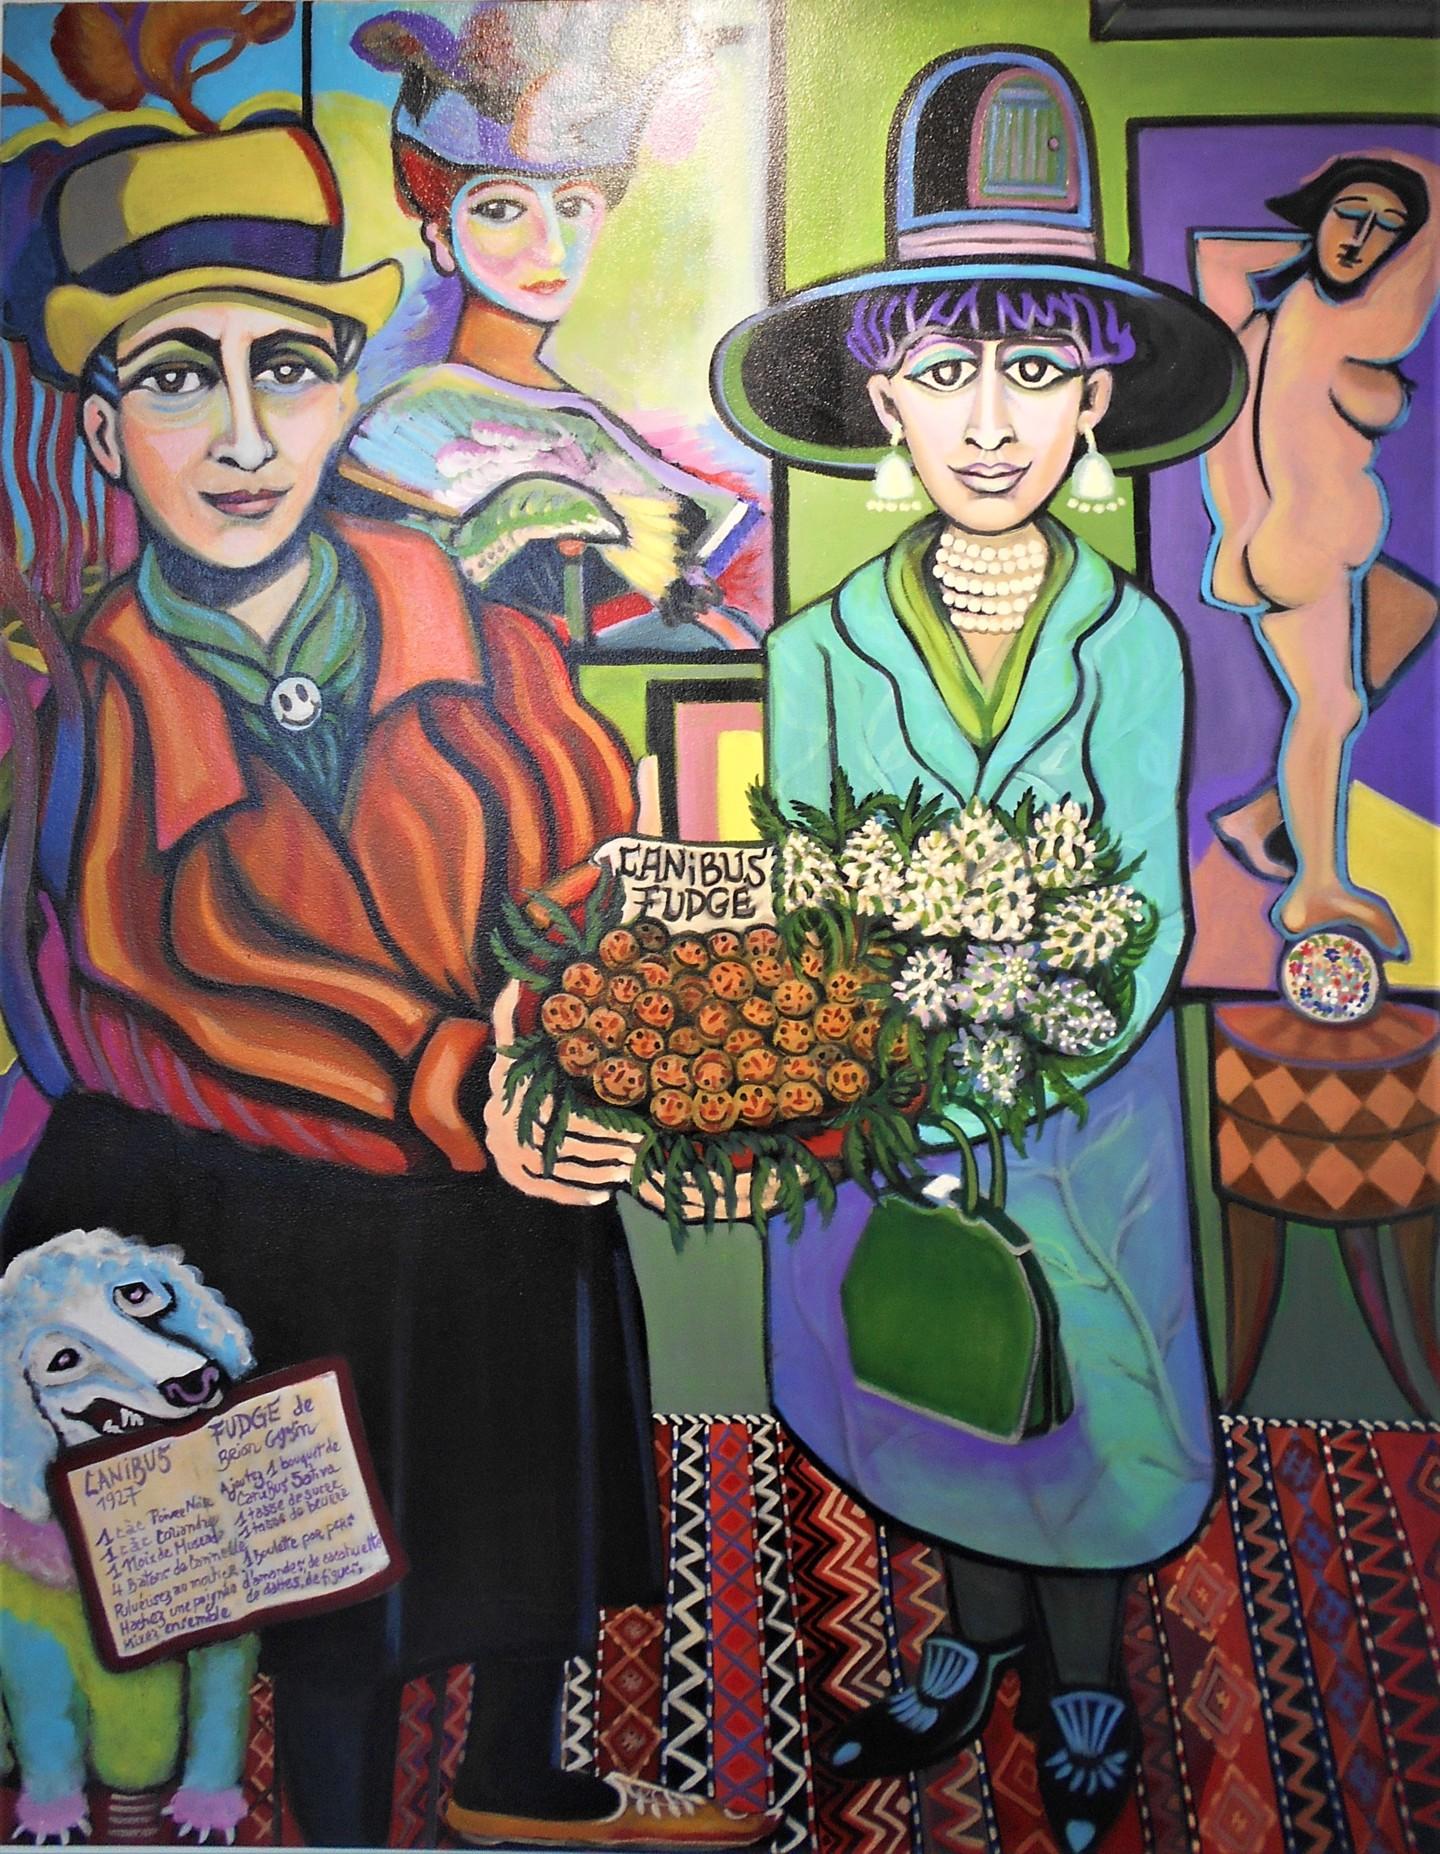 Karotte - Gertrude Stein, Alice Toklas: Les avant-gardistes